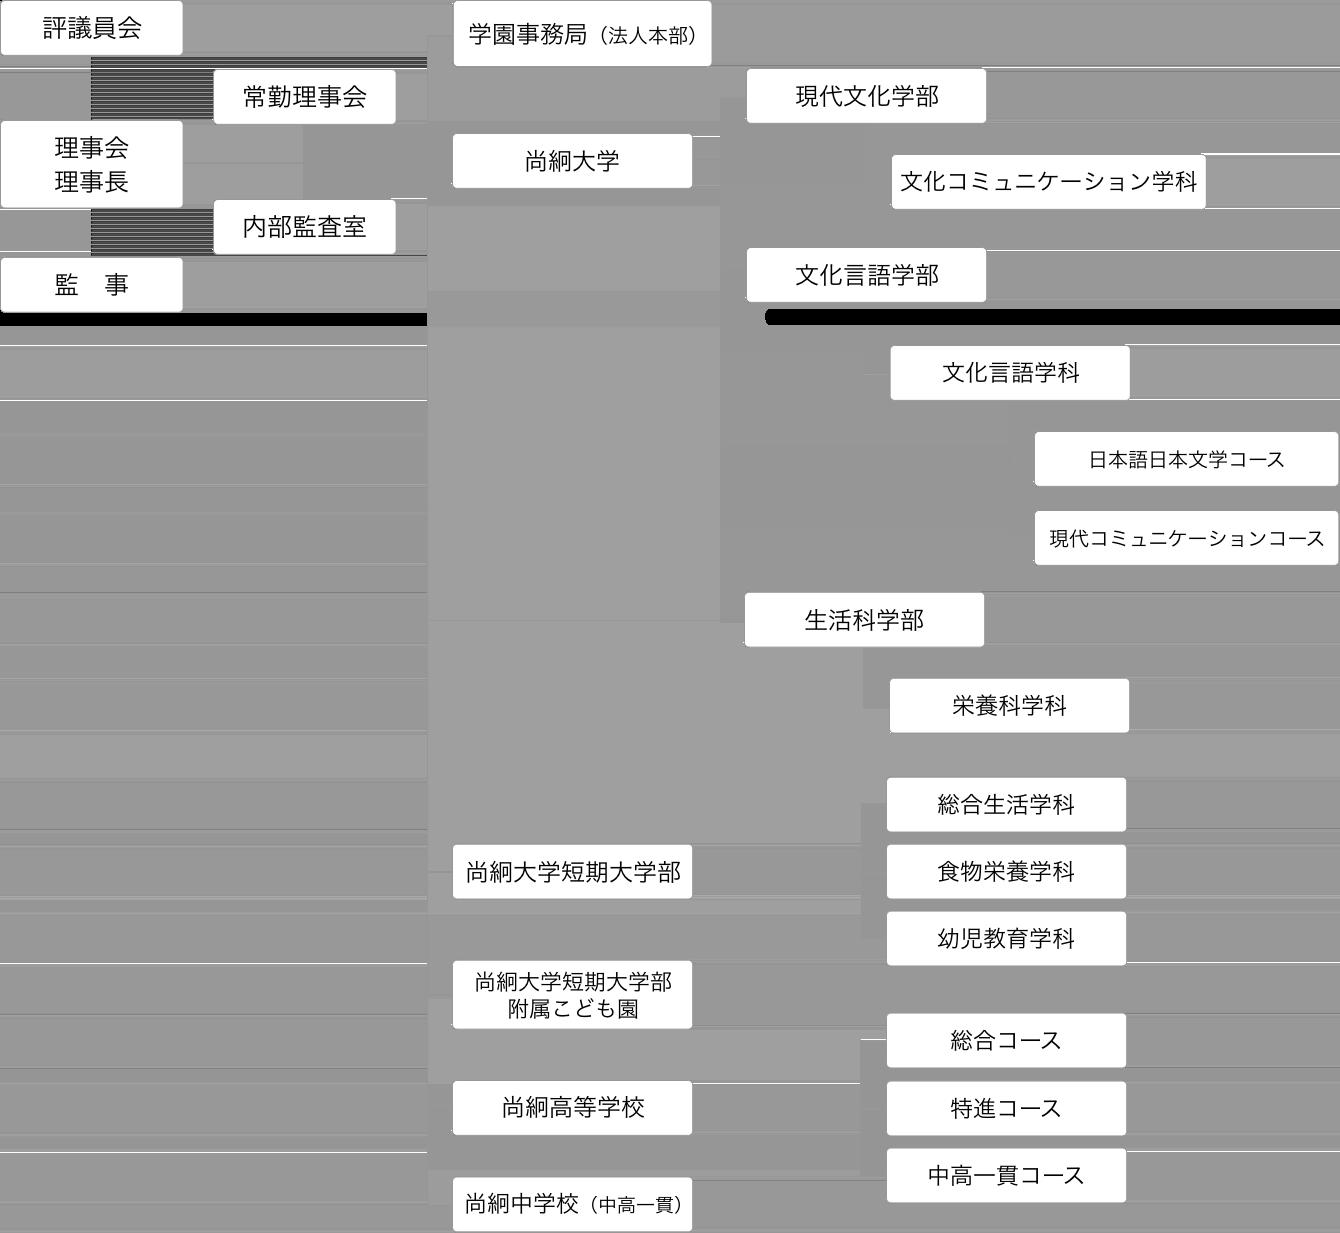 学園の組織図